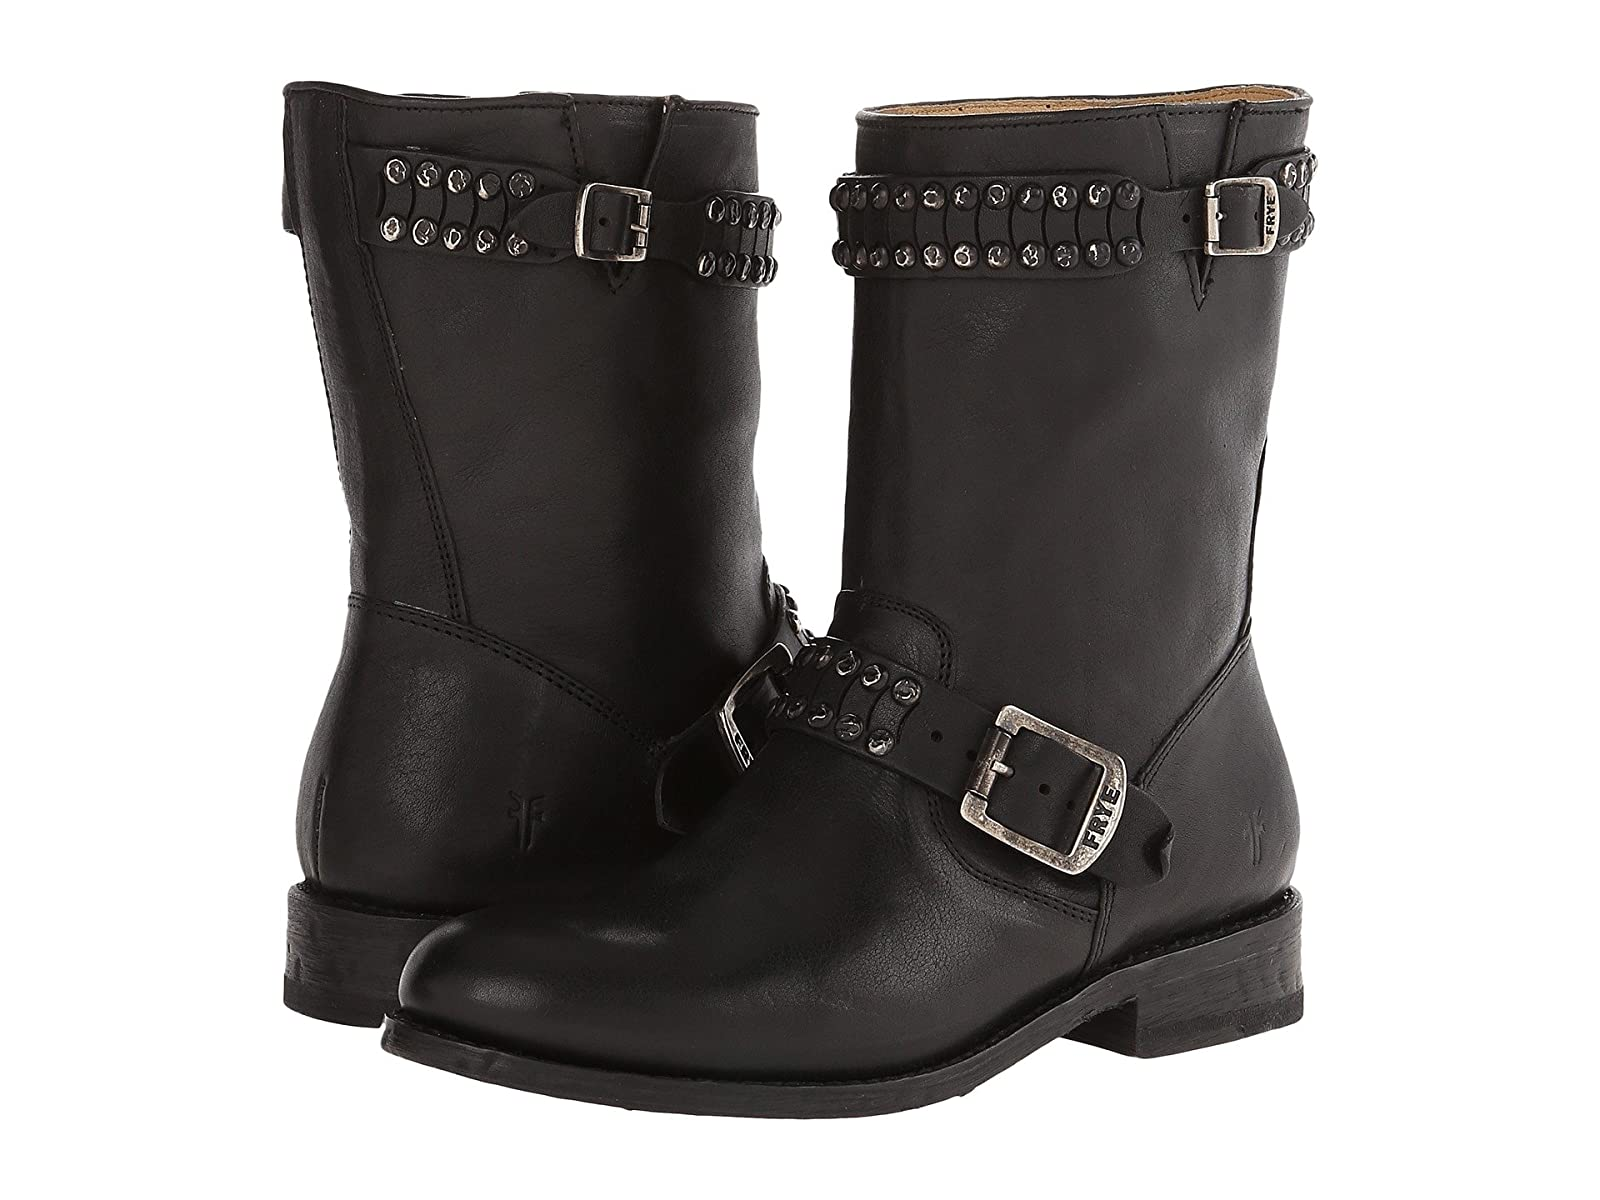 Frye Jayden Cut StudCheap and distinctive eye-catching shoes